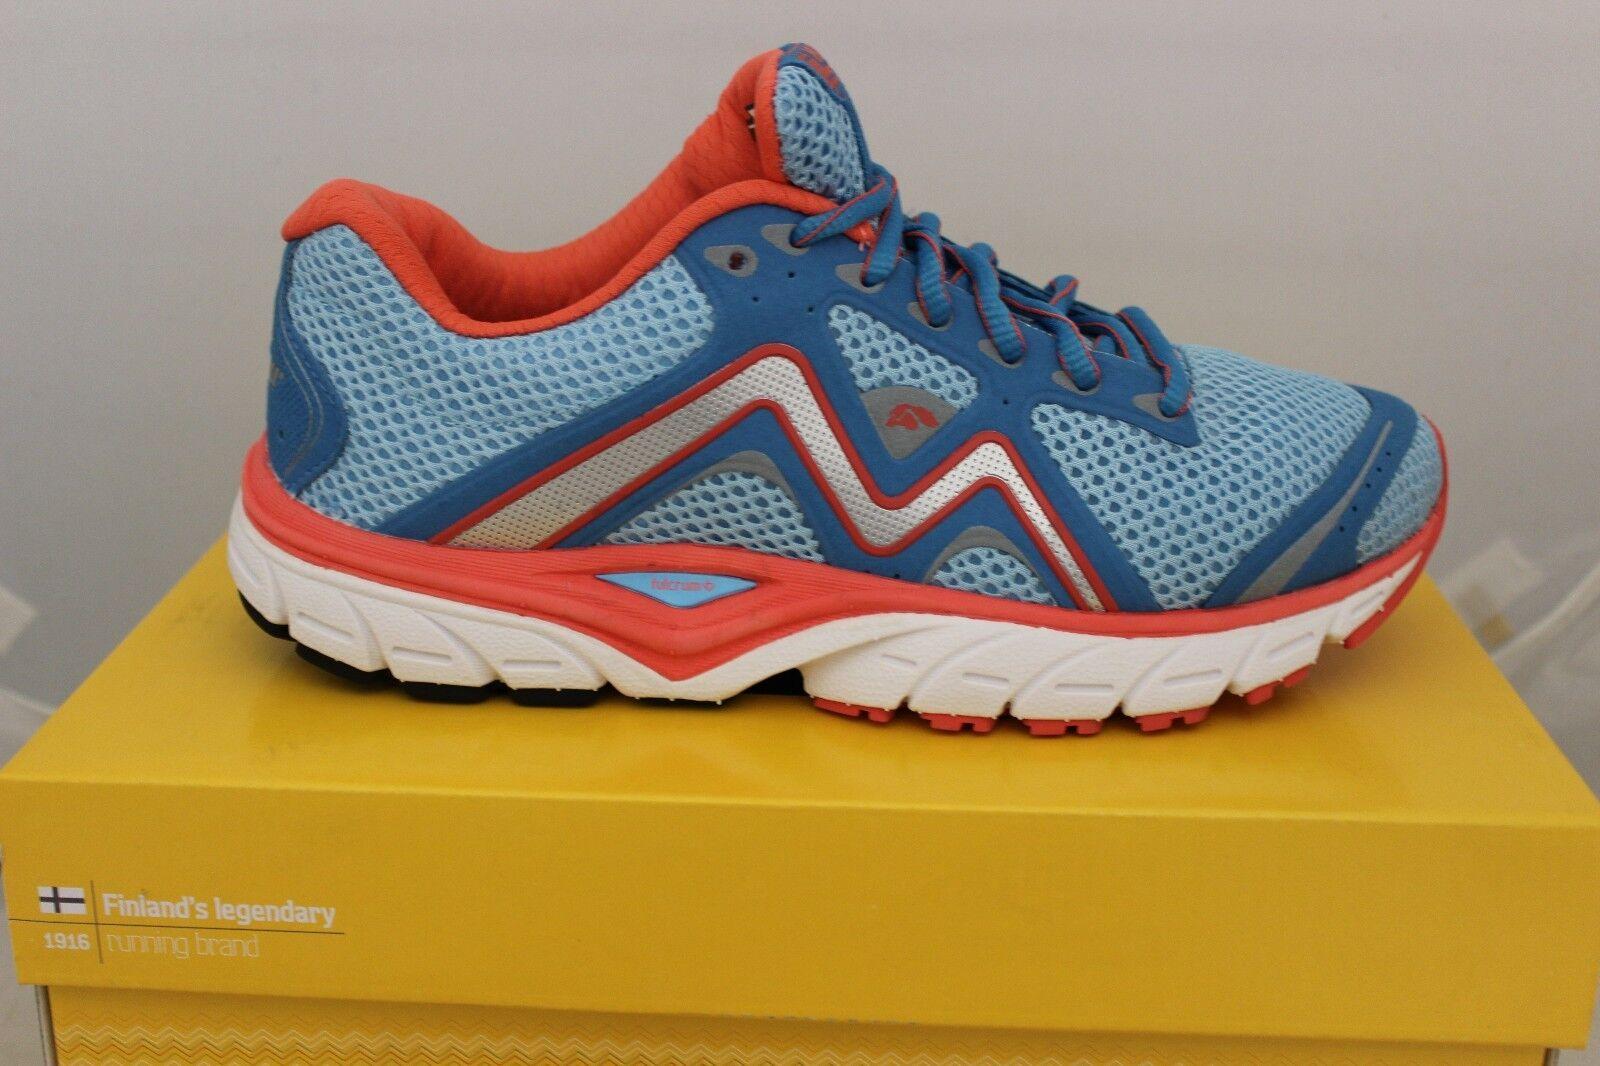 Damen Karhu Schnell 5 Fulcrum Sneakers Laufschuhe SkyBlau/Korallenrot F200161 Sneakers Fulcrum 4b5644